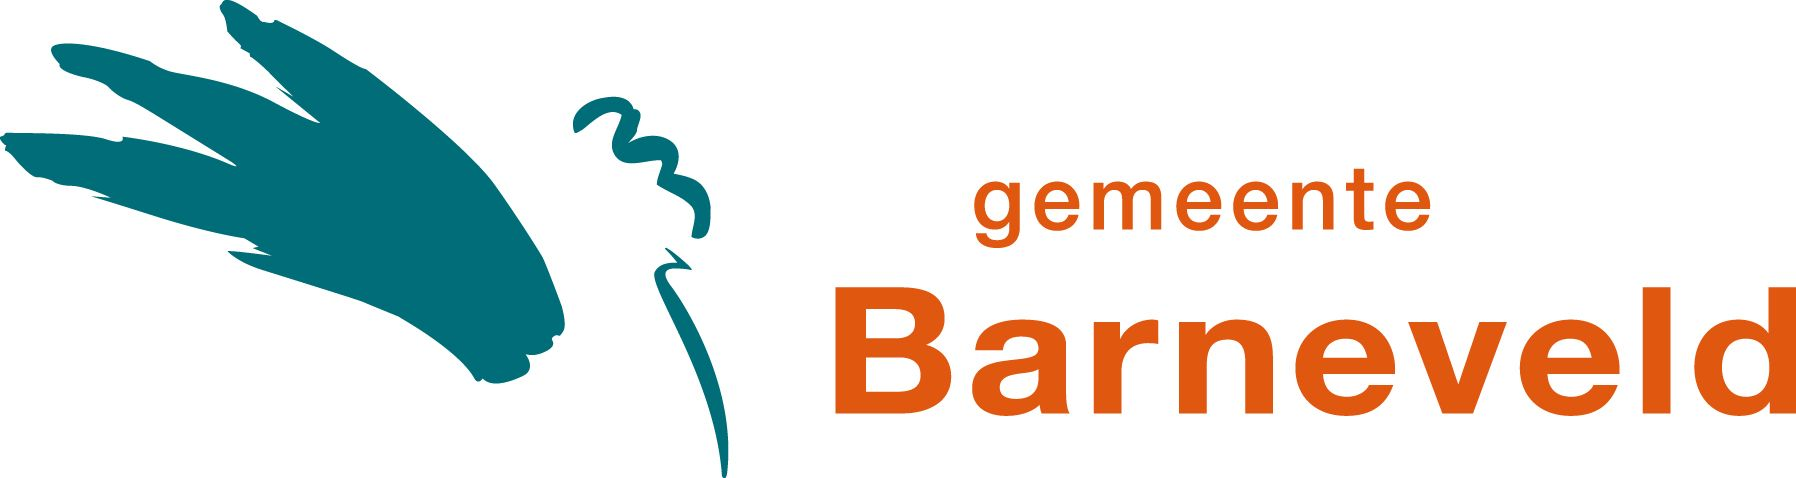 logo gemeente Barneveld